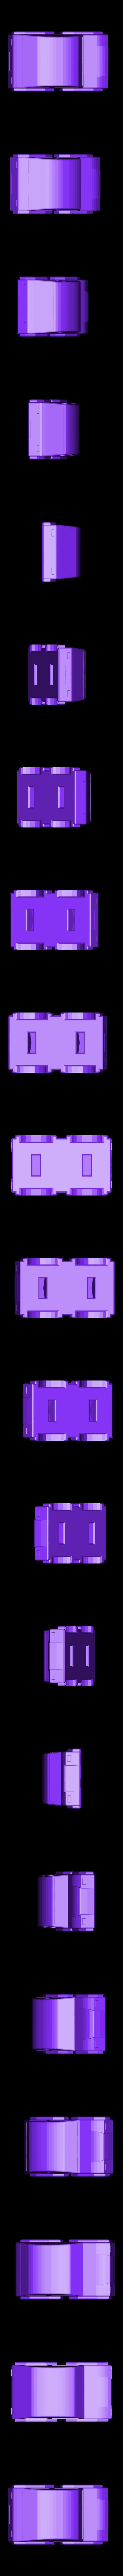 SmallToys-BodyCar5.stl Download STL file SmallToys - Cars pack • 3D print design, Wabby